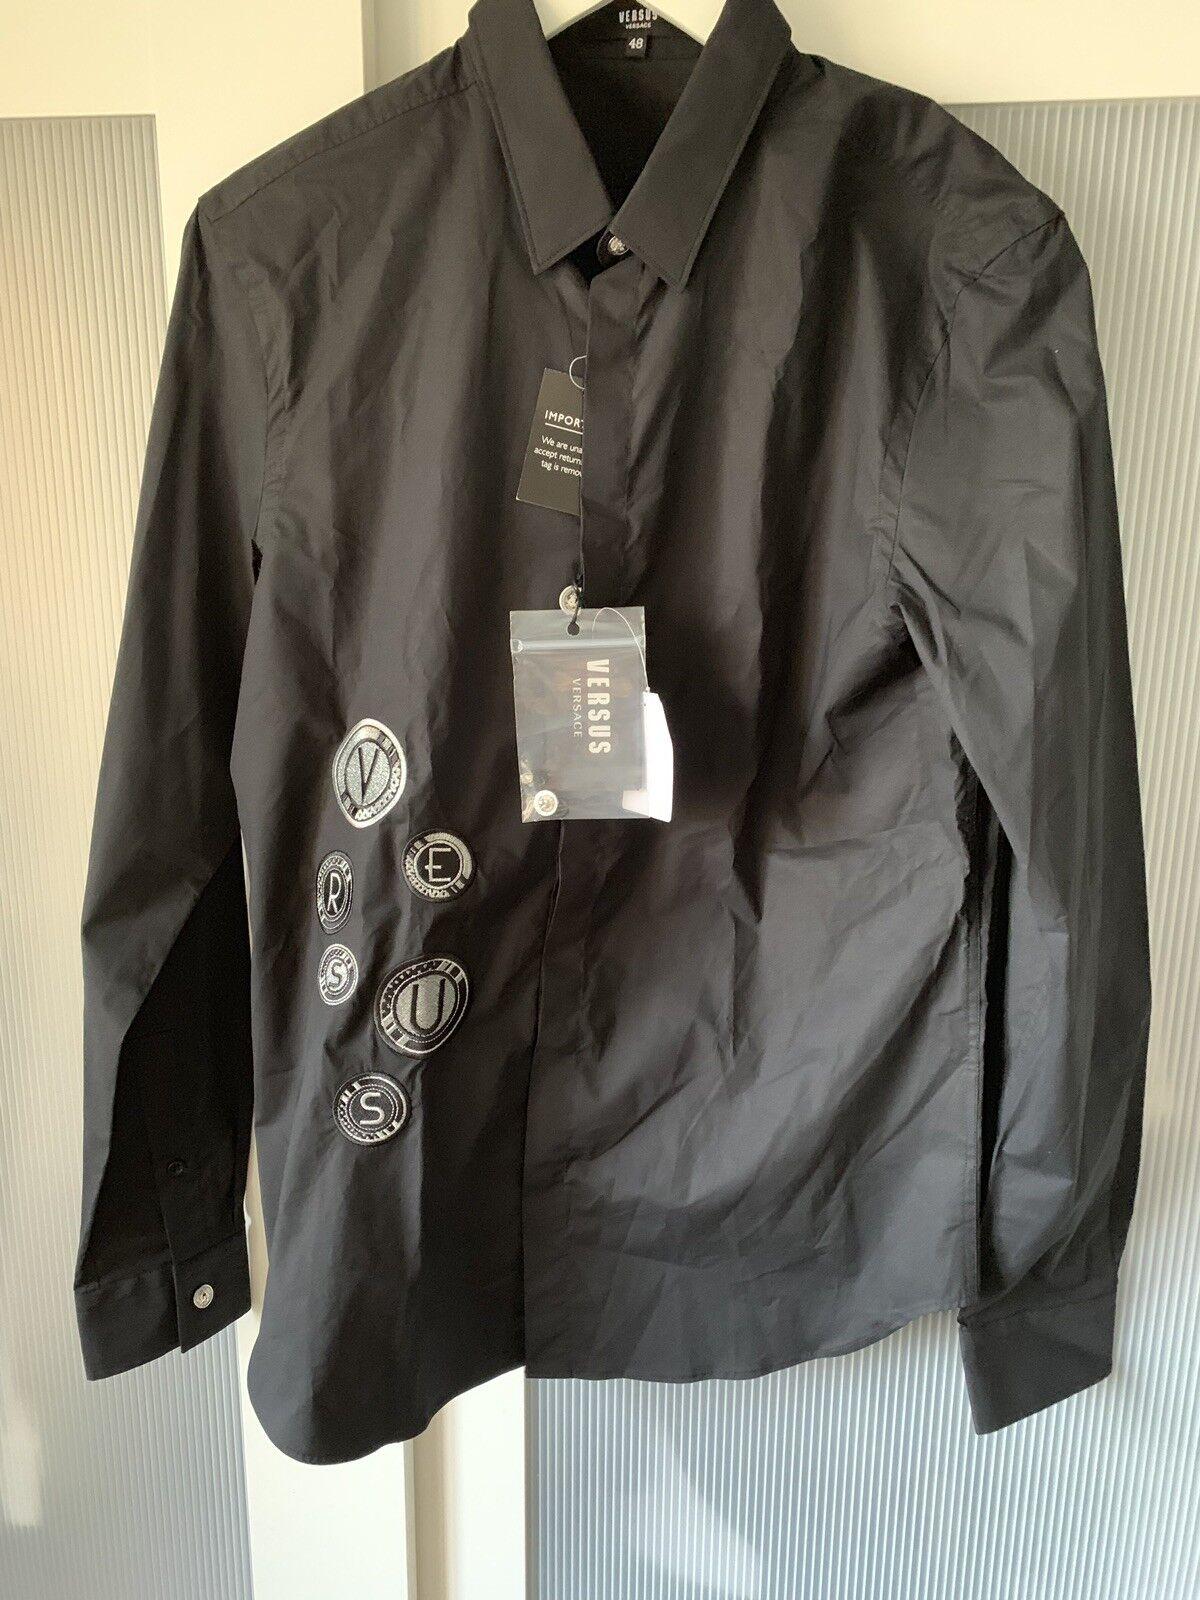 18ea34ea Versace men shirt size M 100% authentic ultra rare top Versus okfhrj12819- T-Shirts